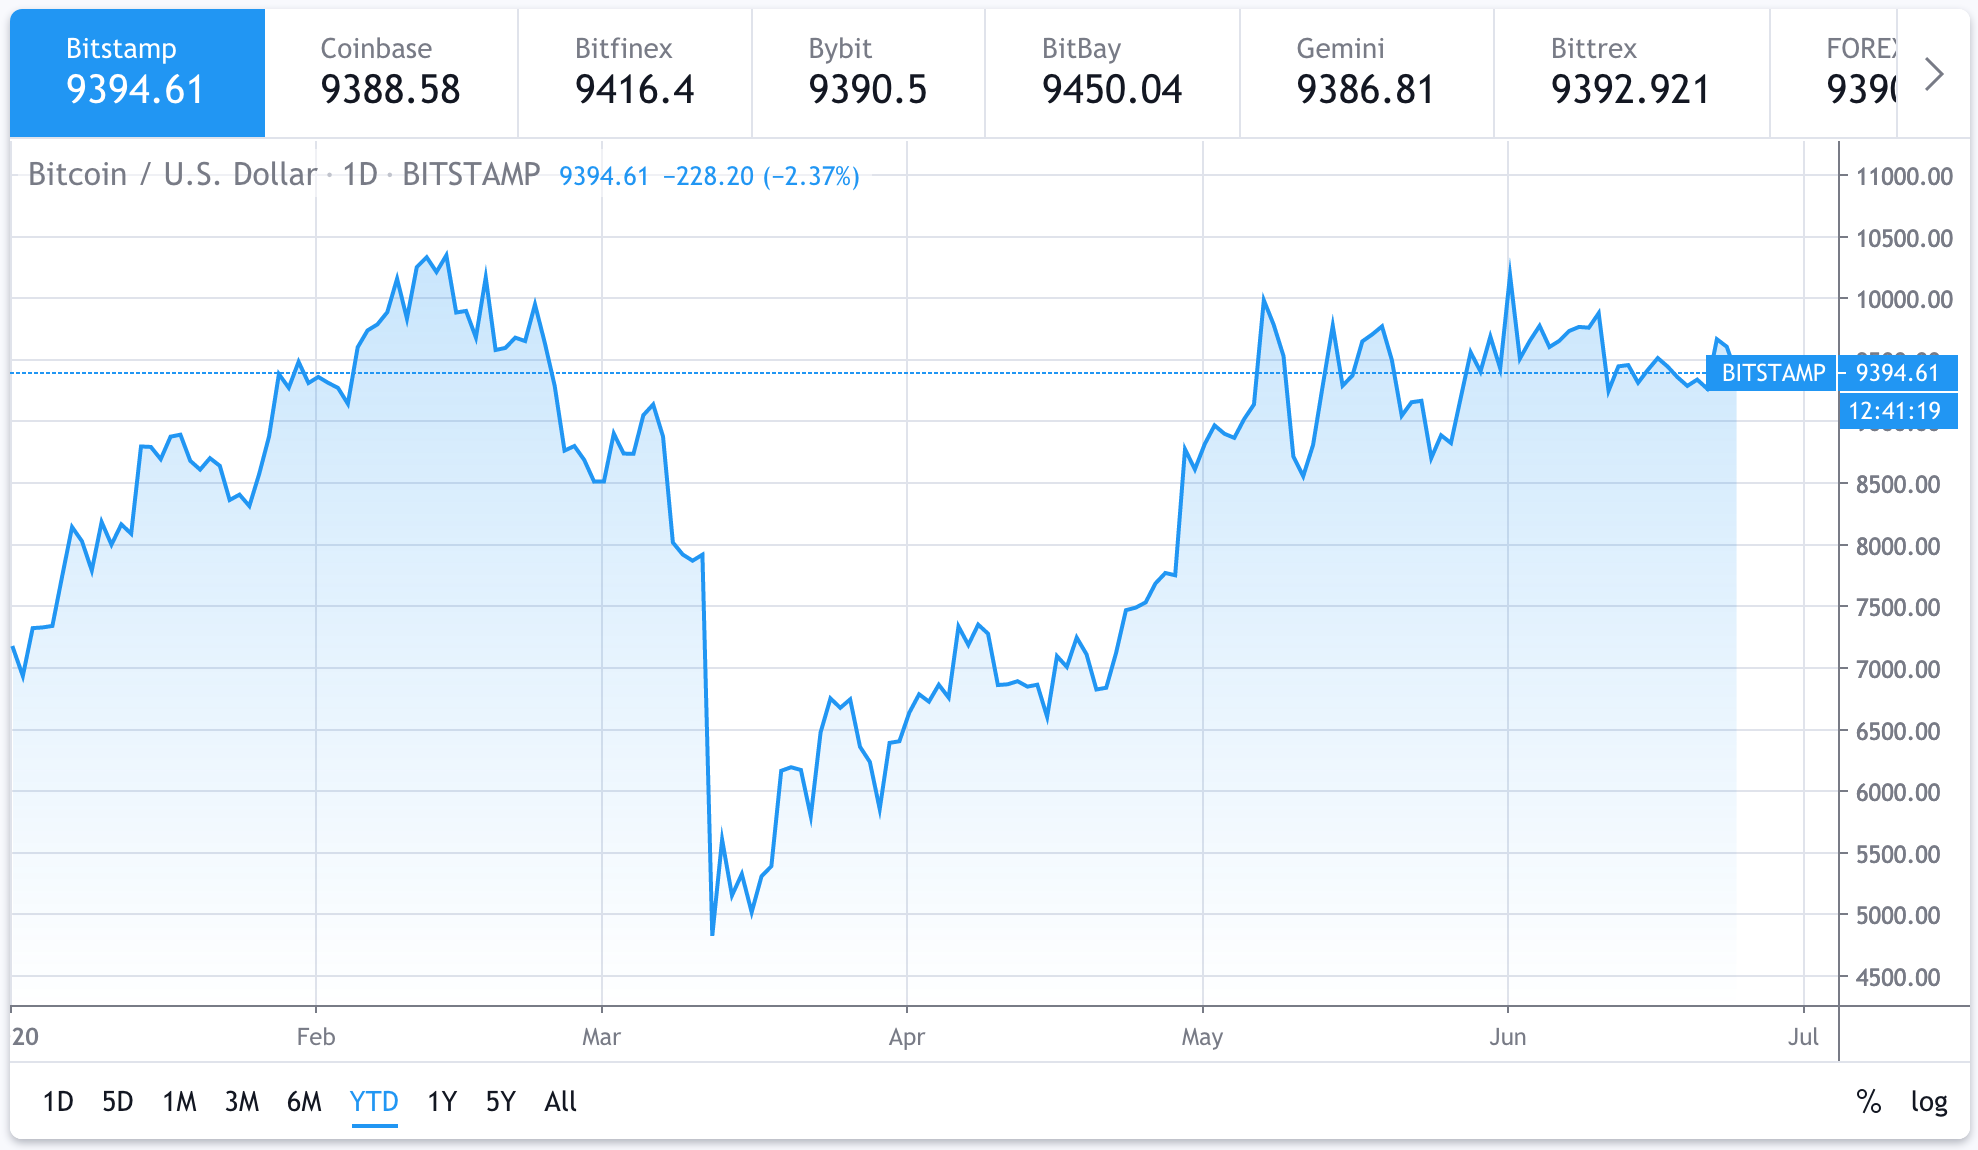 Bitcoin's price since January